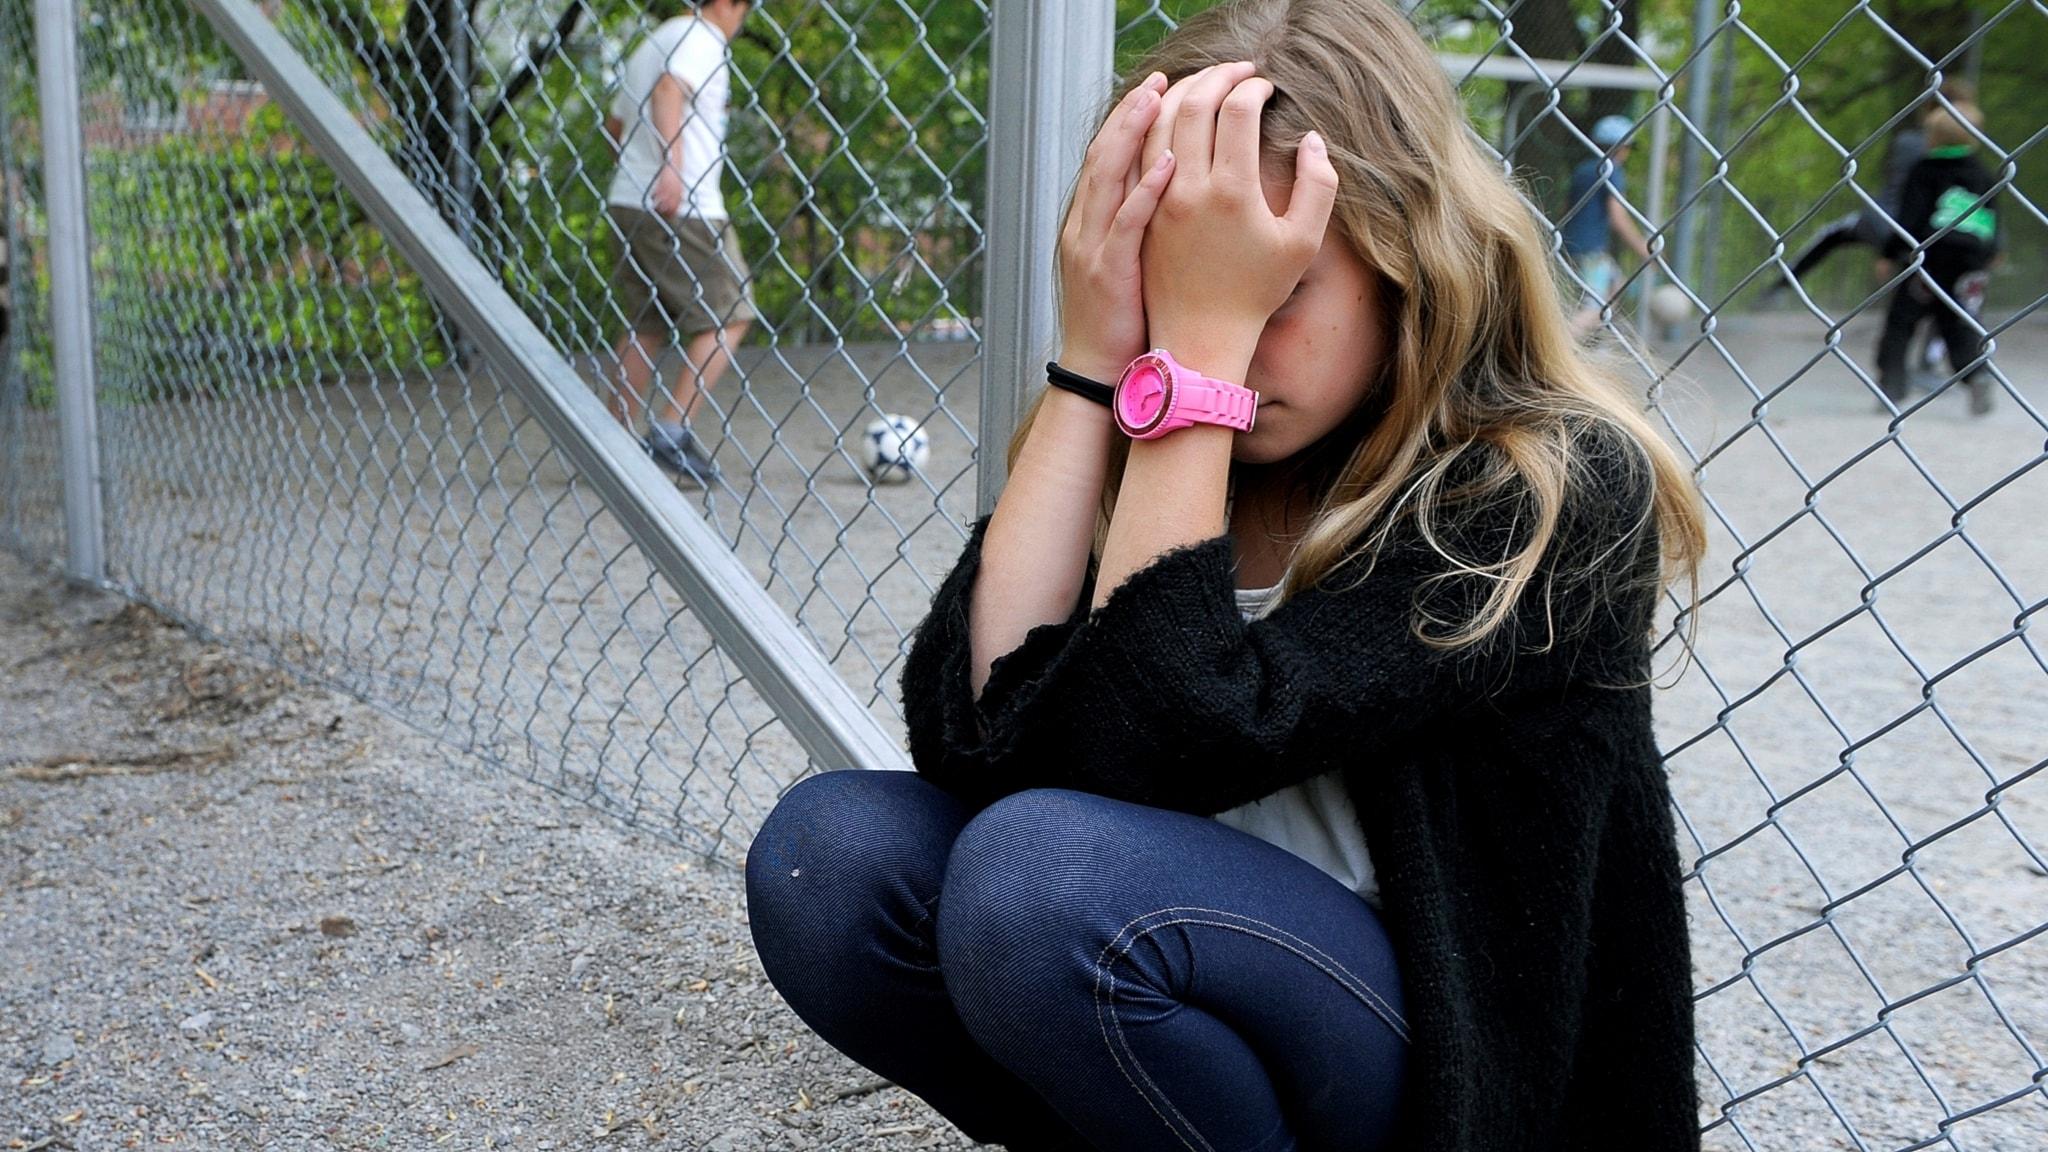 Skola kritiseras for hantering av mobbningsfall